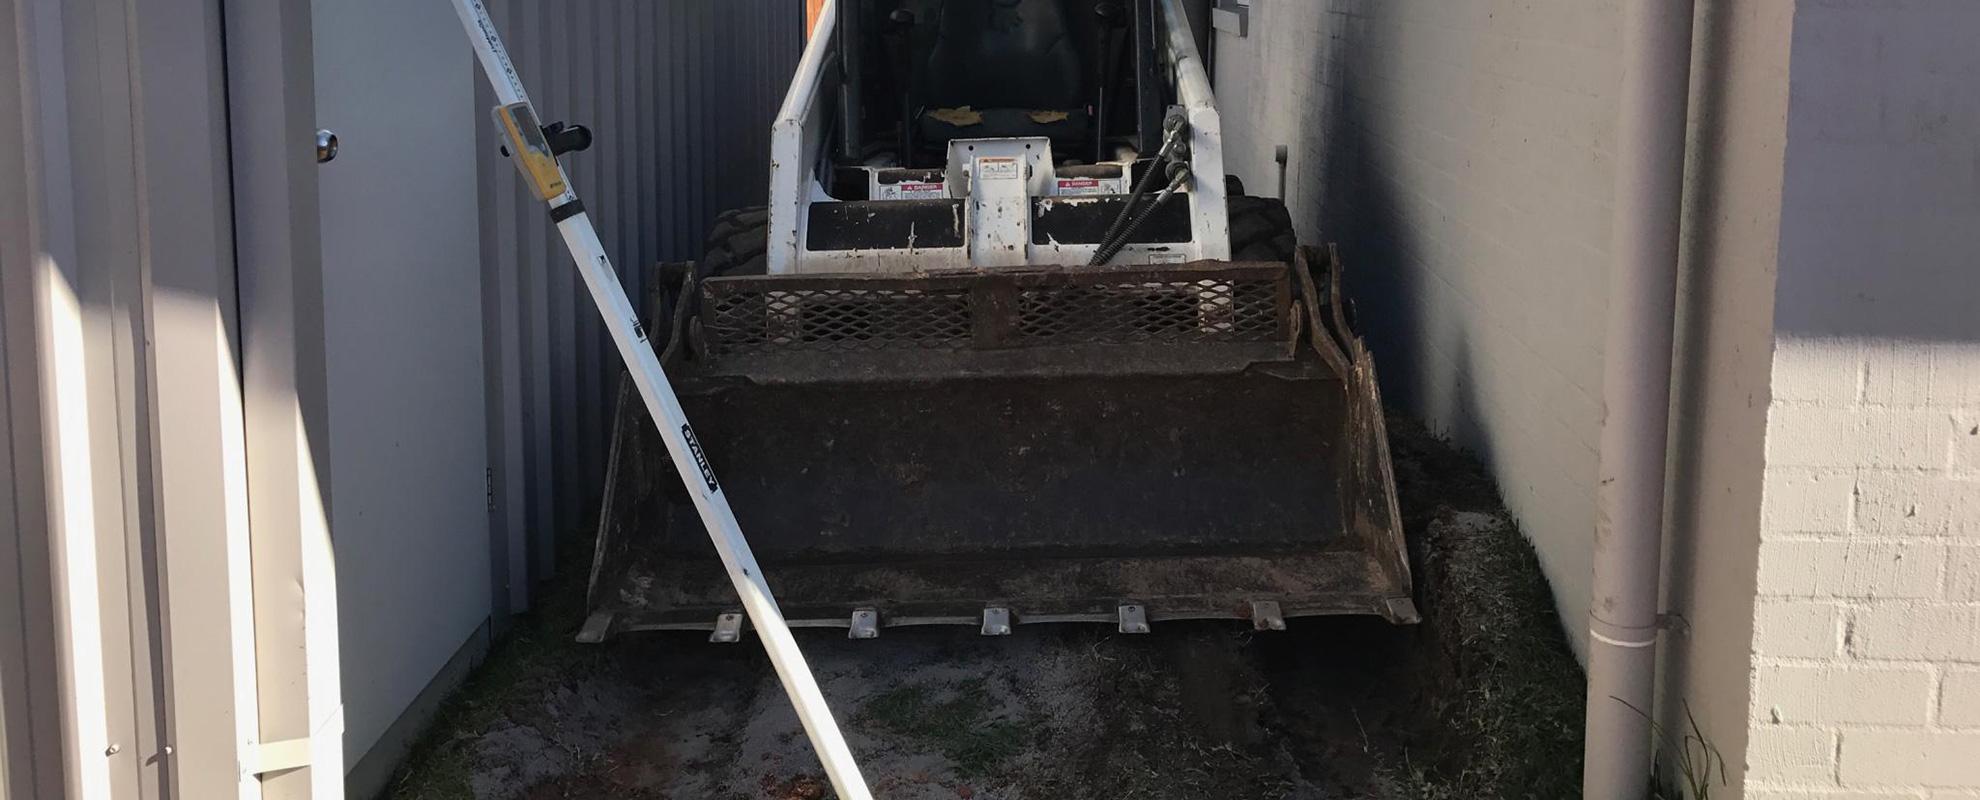 Tight-access machinery brisbane